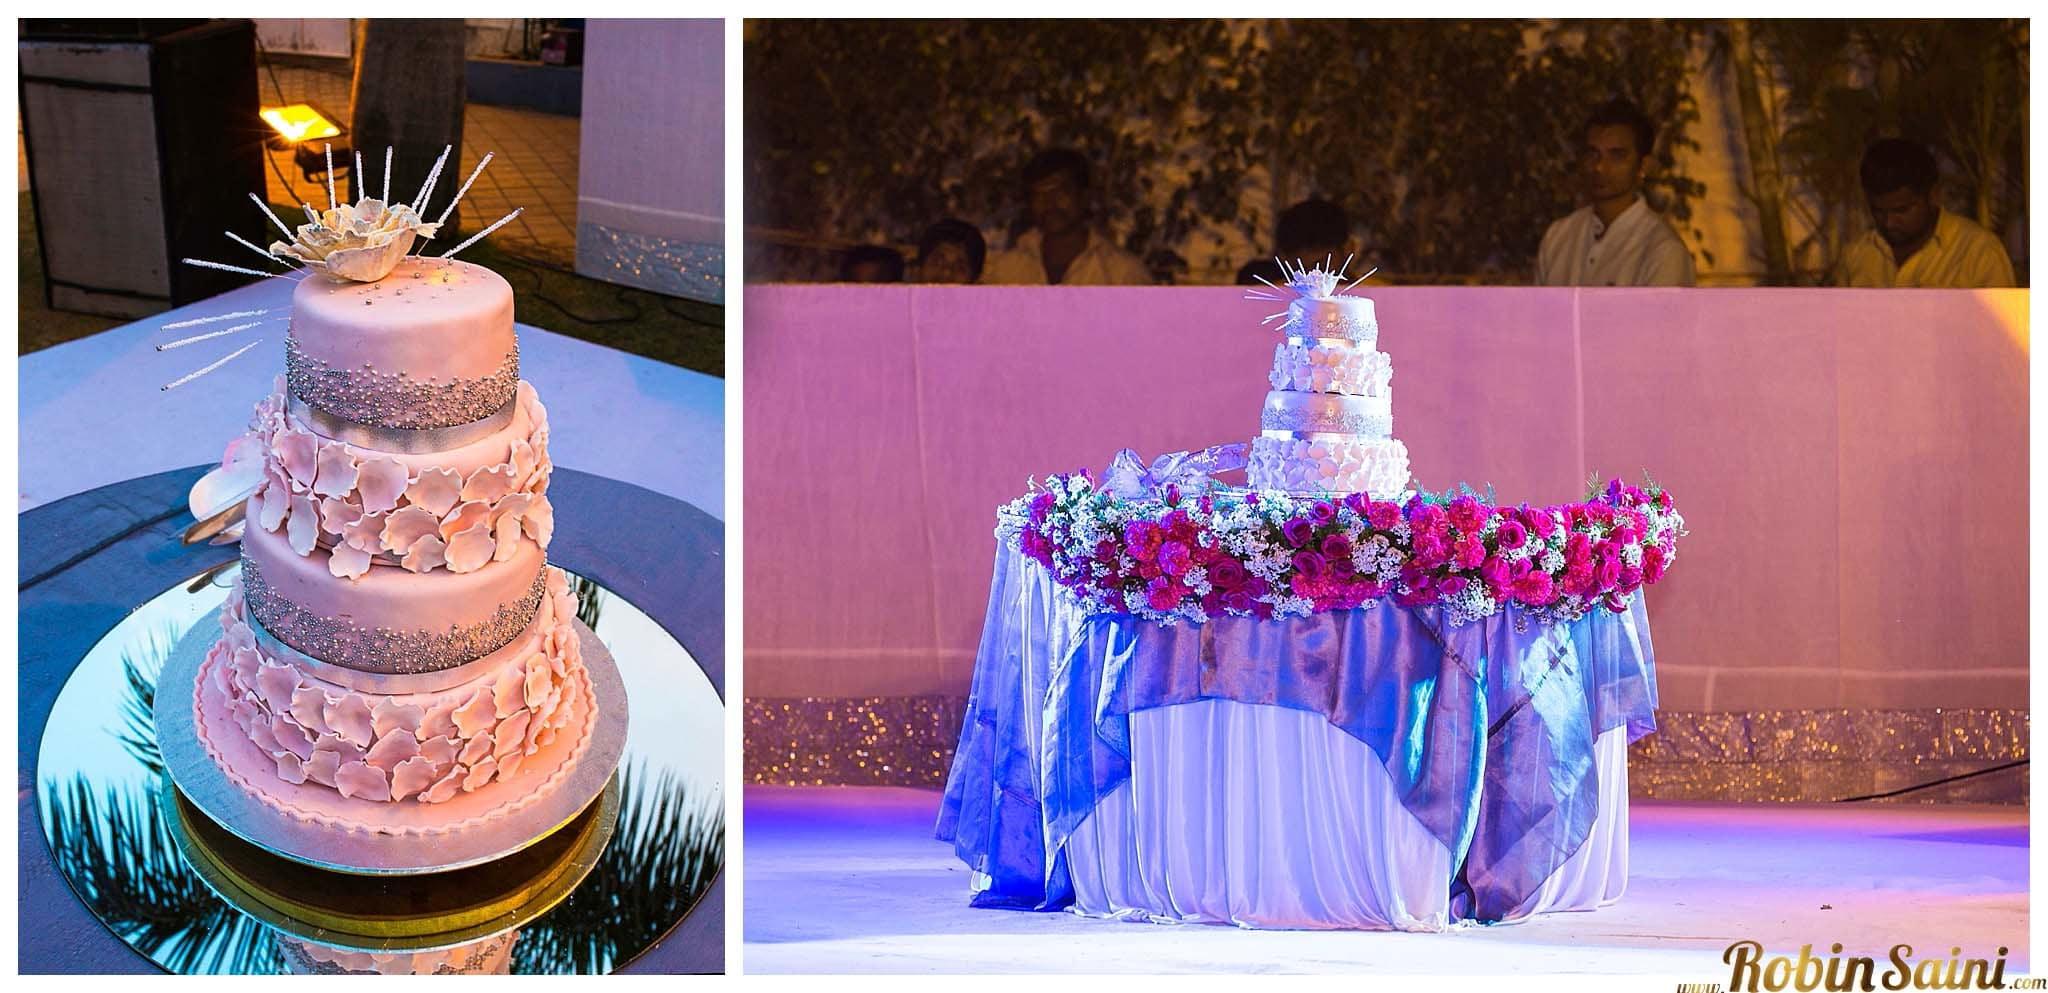 beautiful wedding cake:robin saini photography